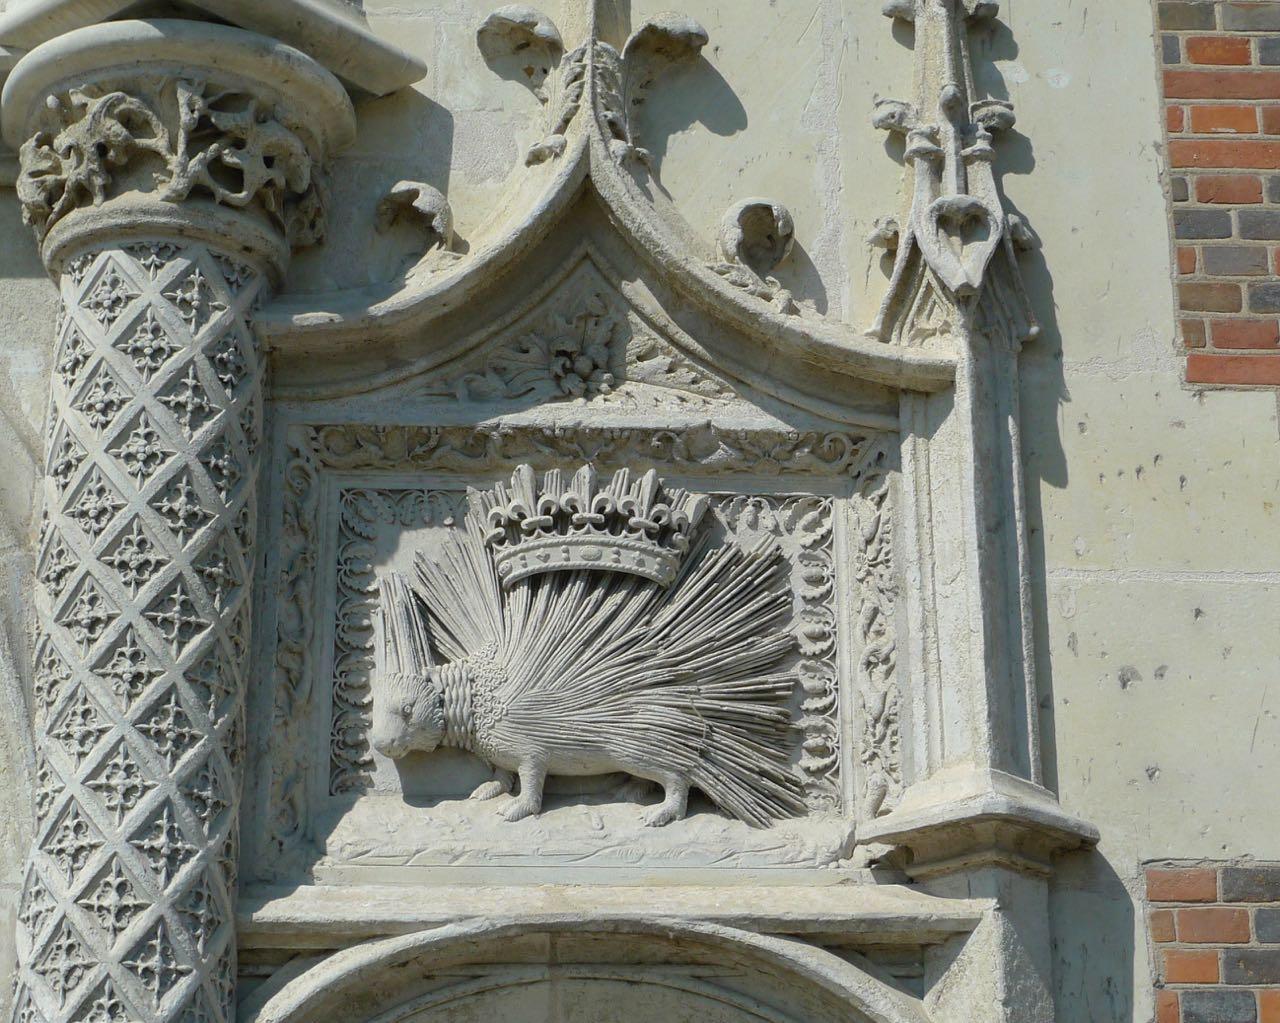 The royal porcupine